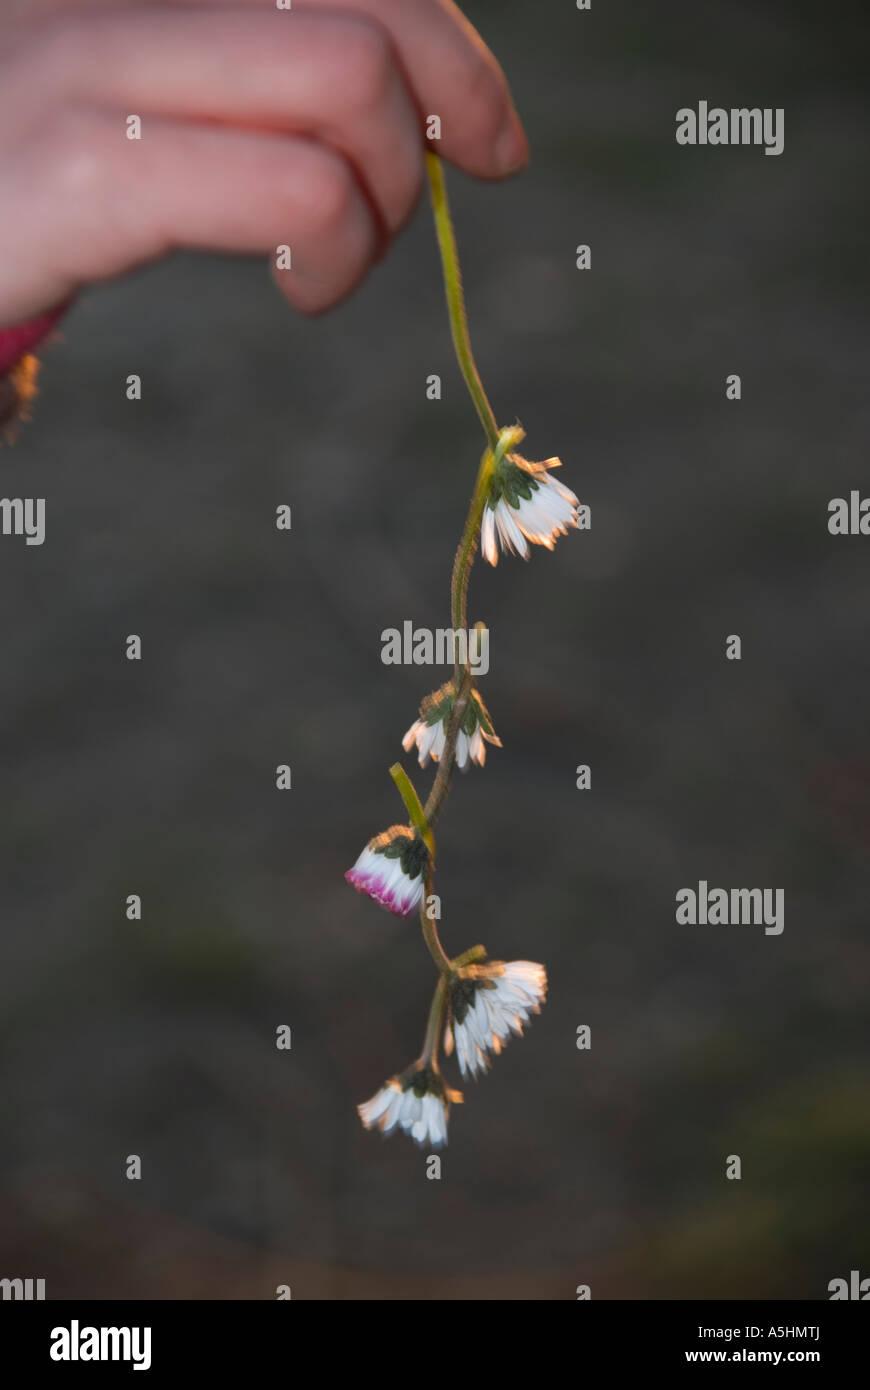 dandelions dangle hanging spring flower undignified - Stock Image